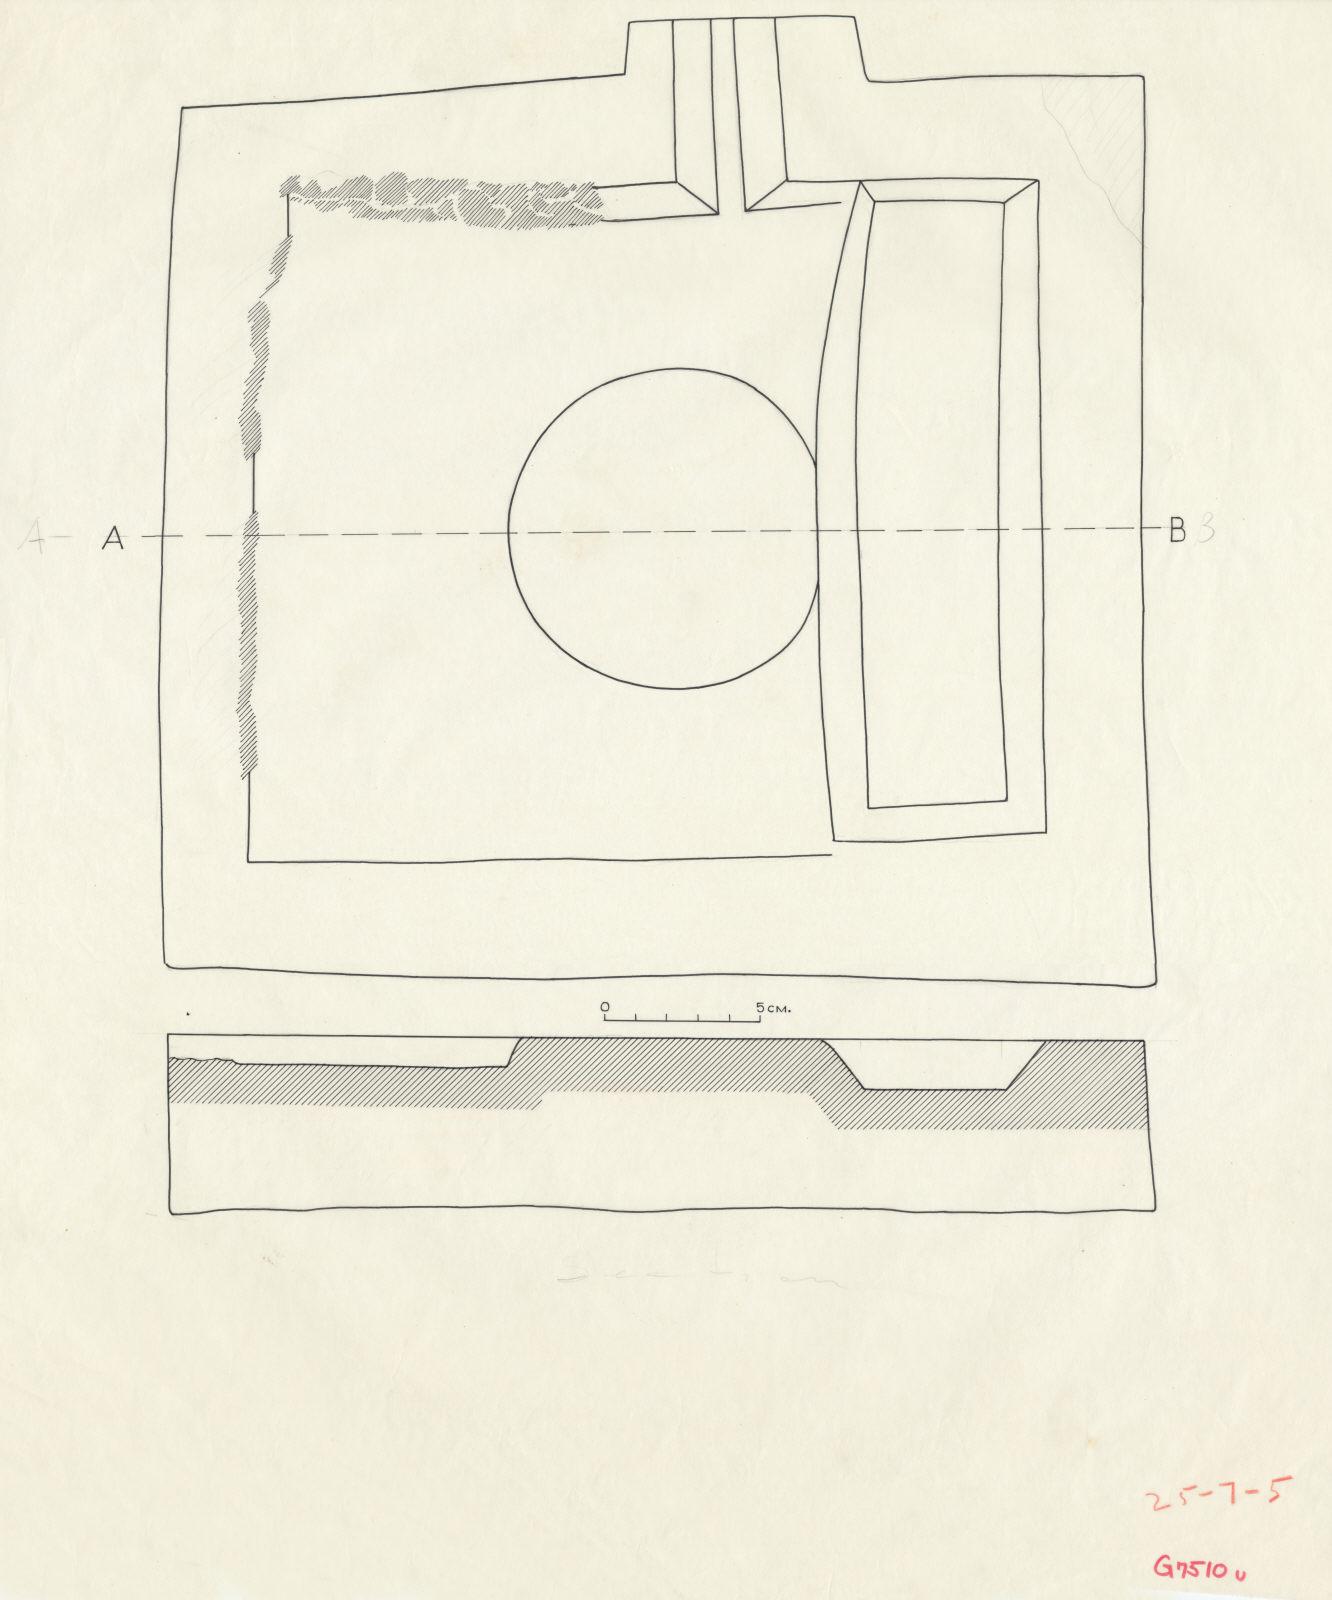 Drawings: G 7510, Shaft U: offering basin